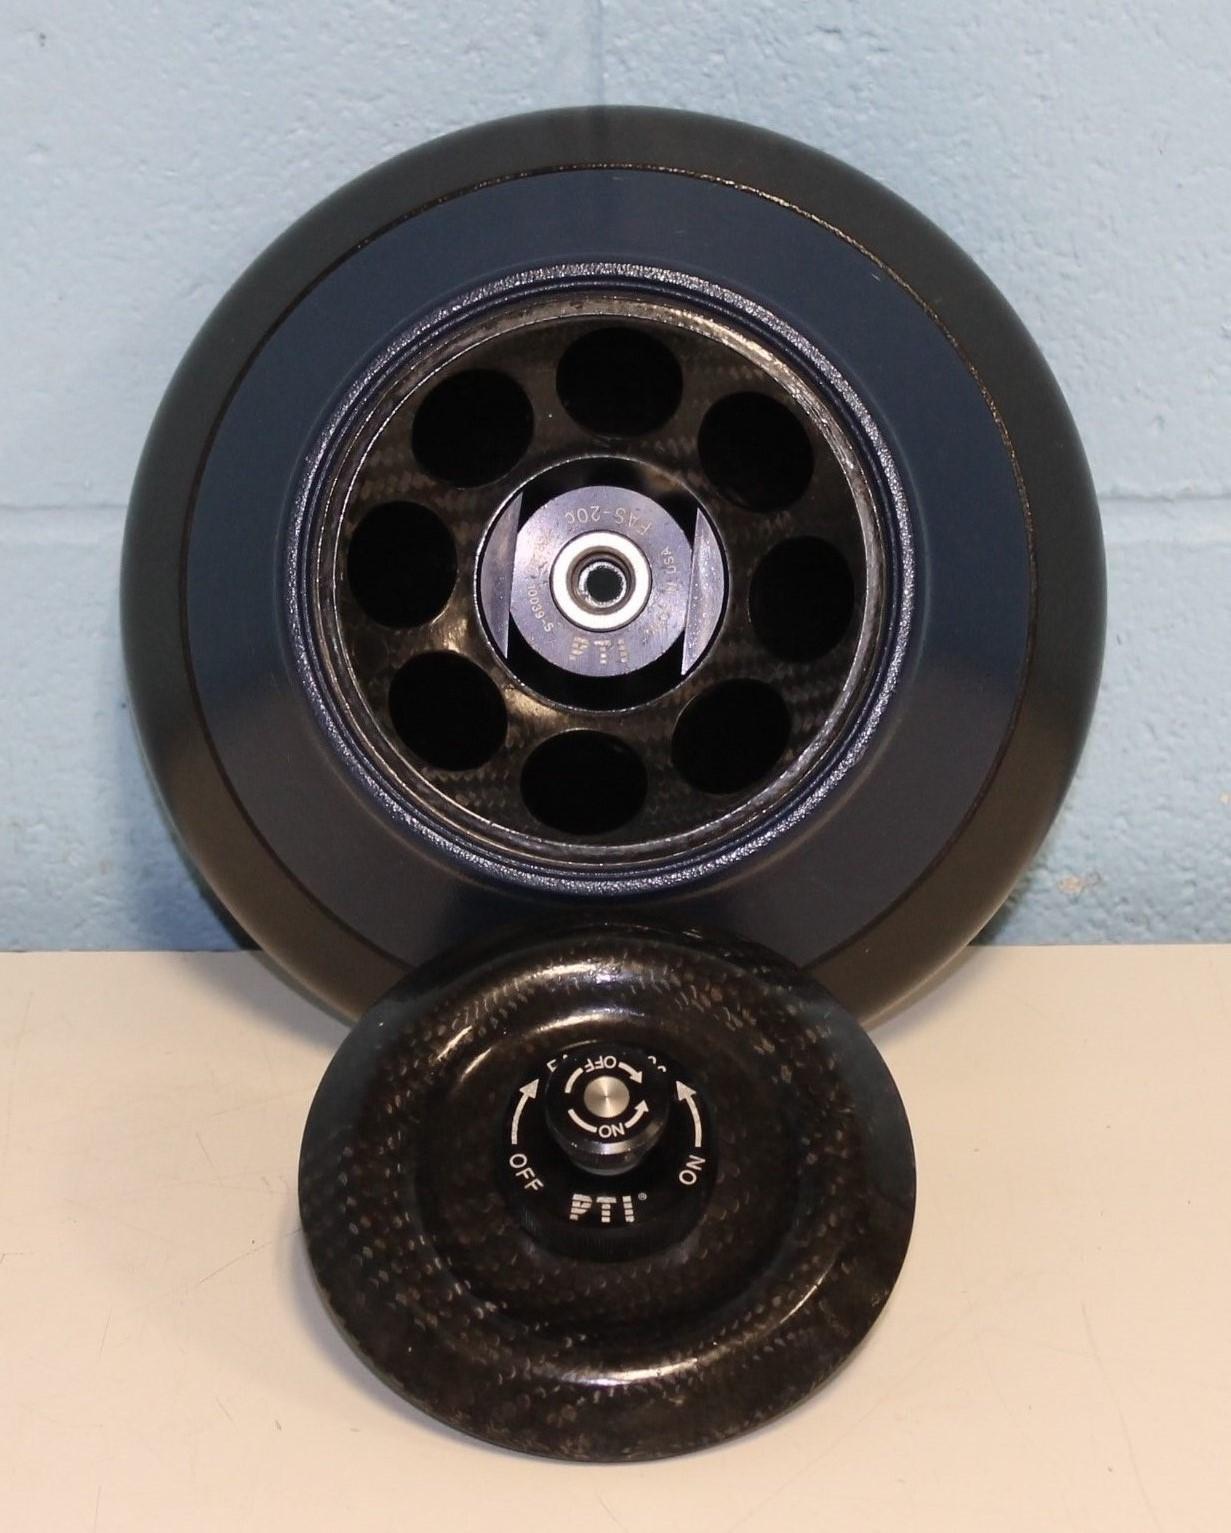 PTI/Piramoon Technologies FAS 20C Fixed Angle Rotor Image